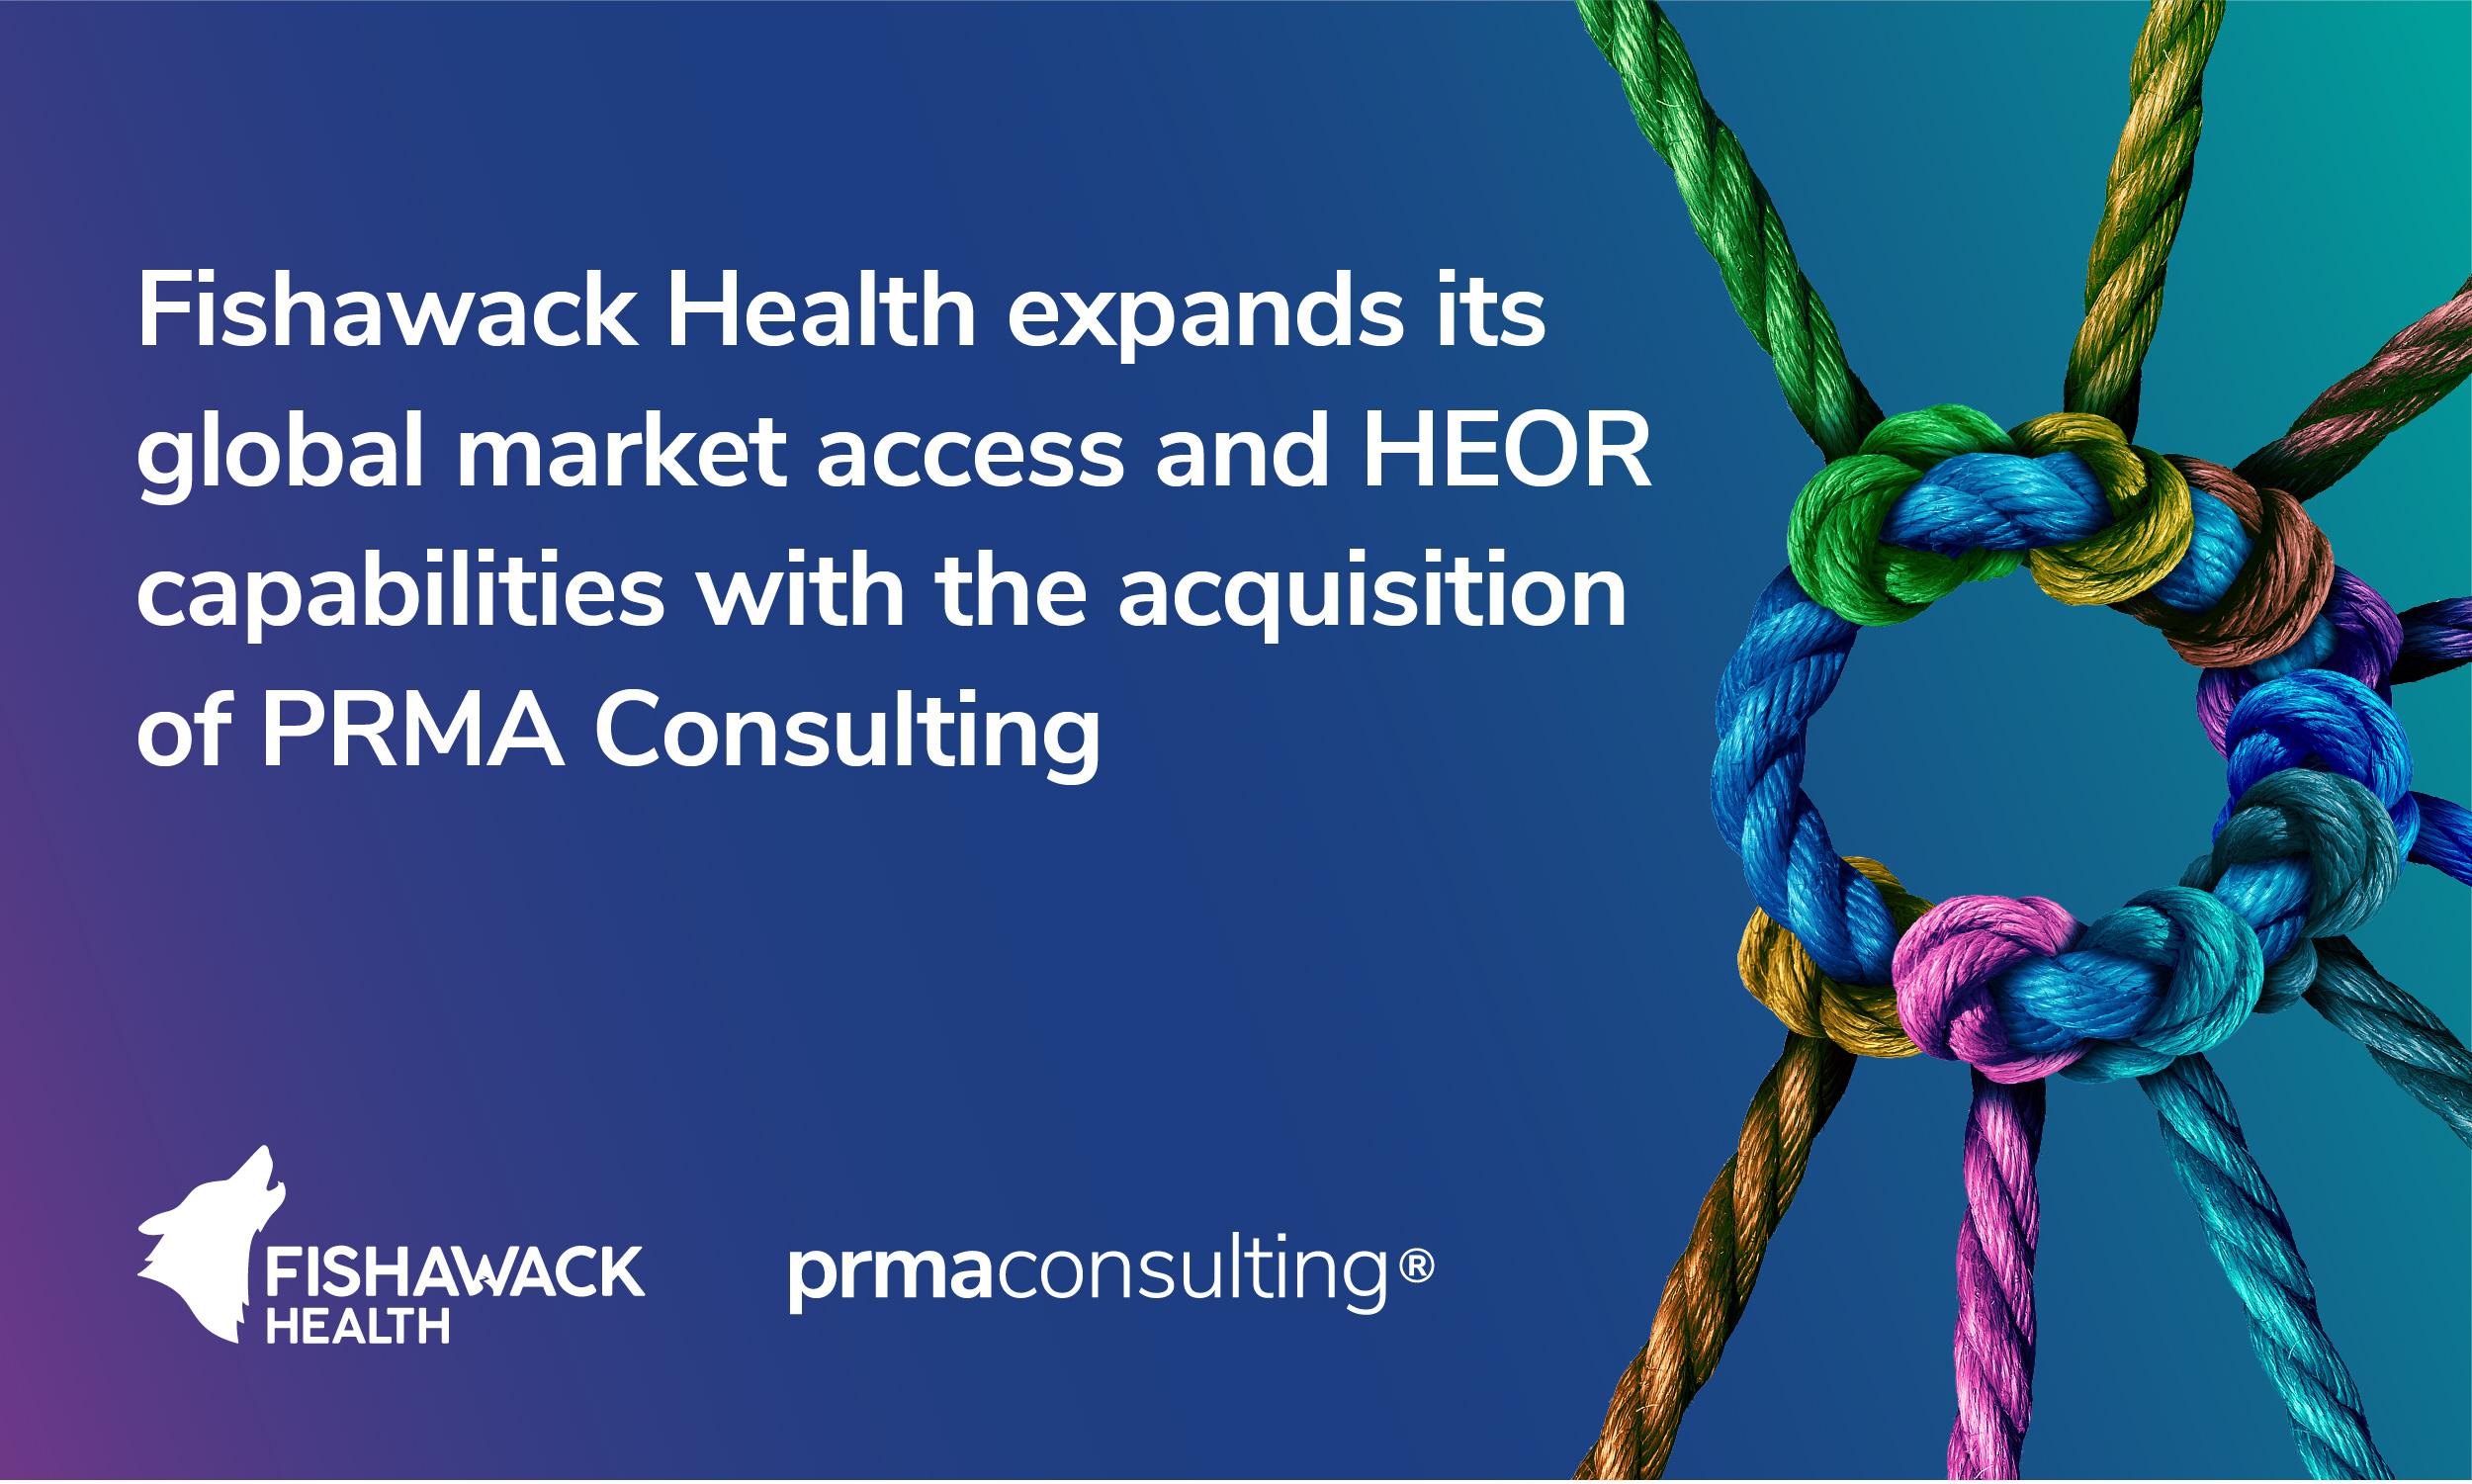 Fishawack Health Global Market Access